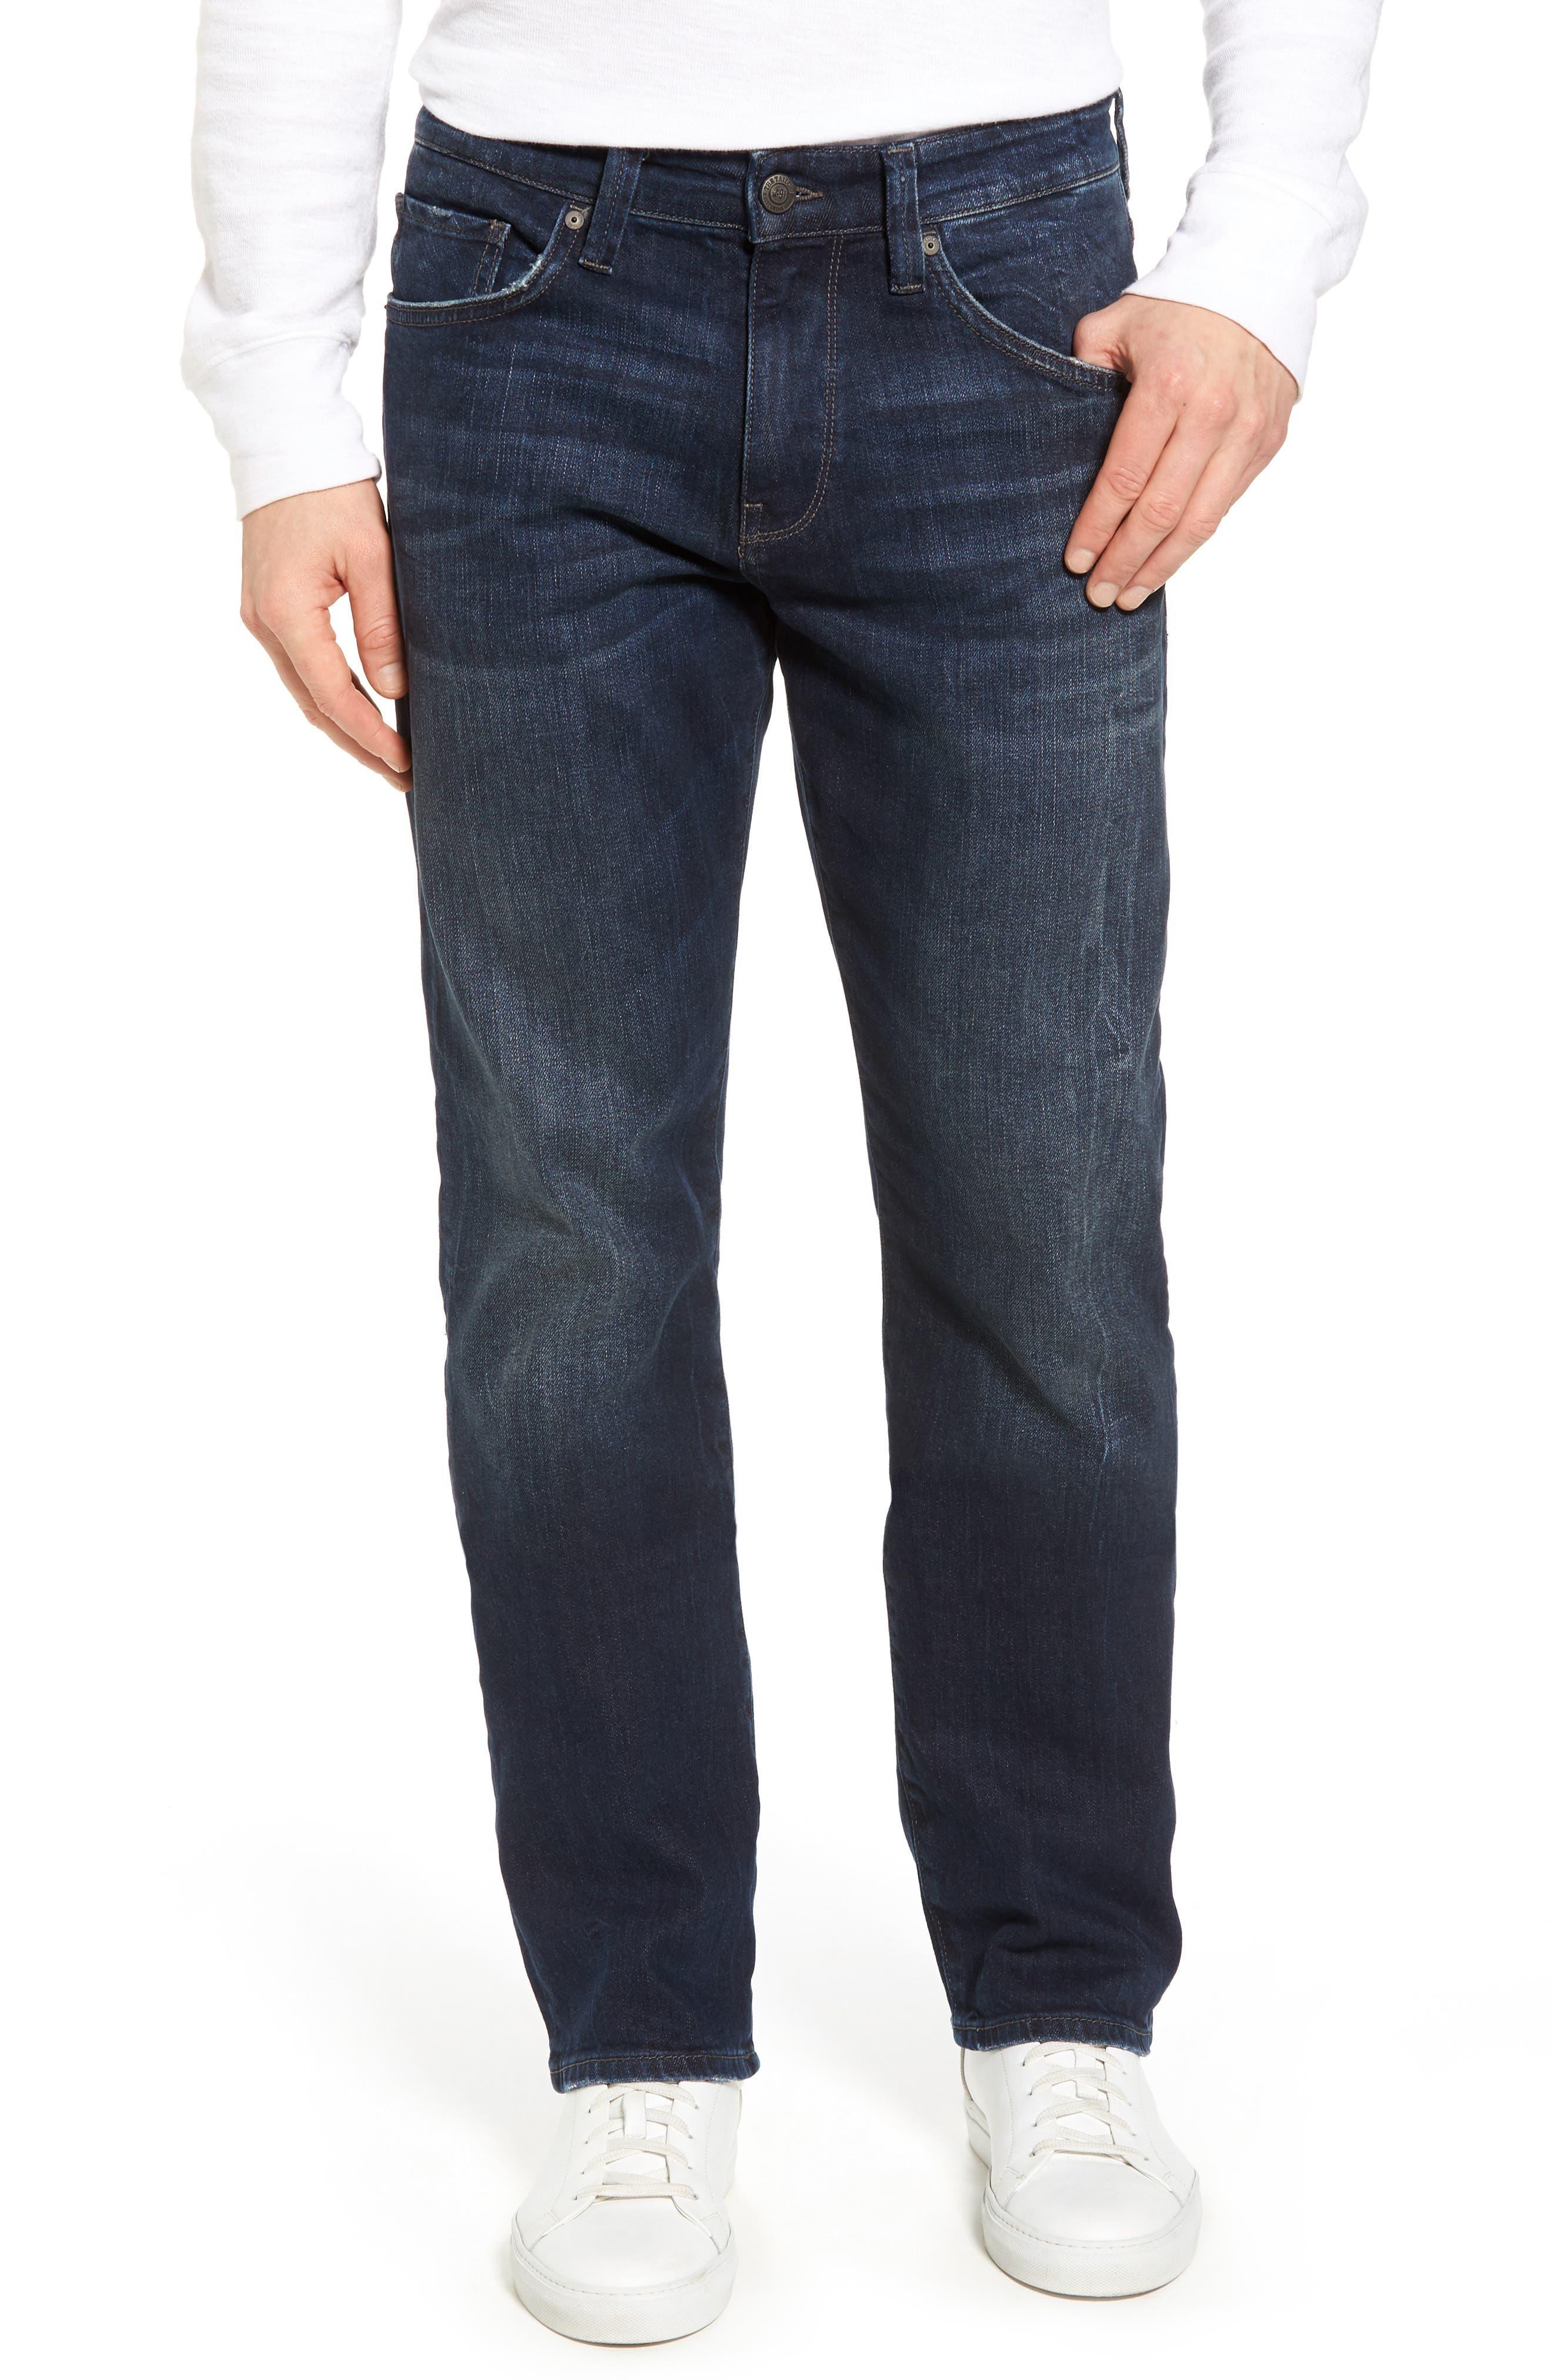 MAVI JEANS,                             Myles Straight Leg Jeans,                             Main thumbnail 1, color,                             401